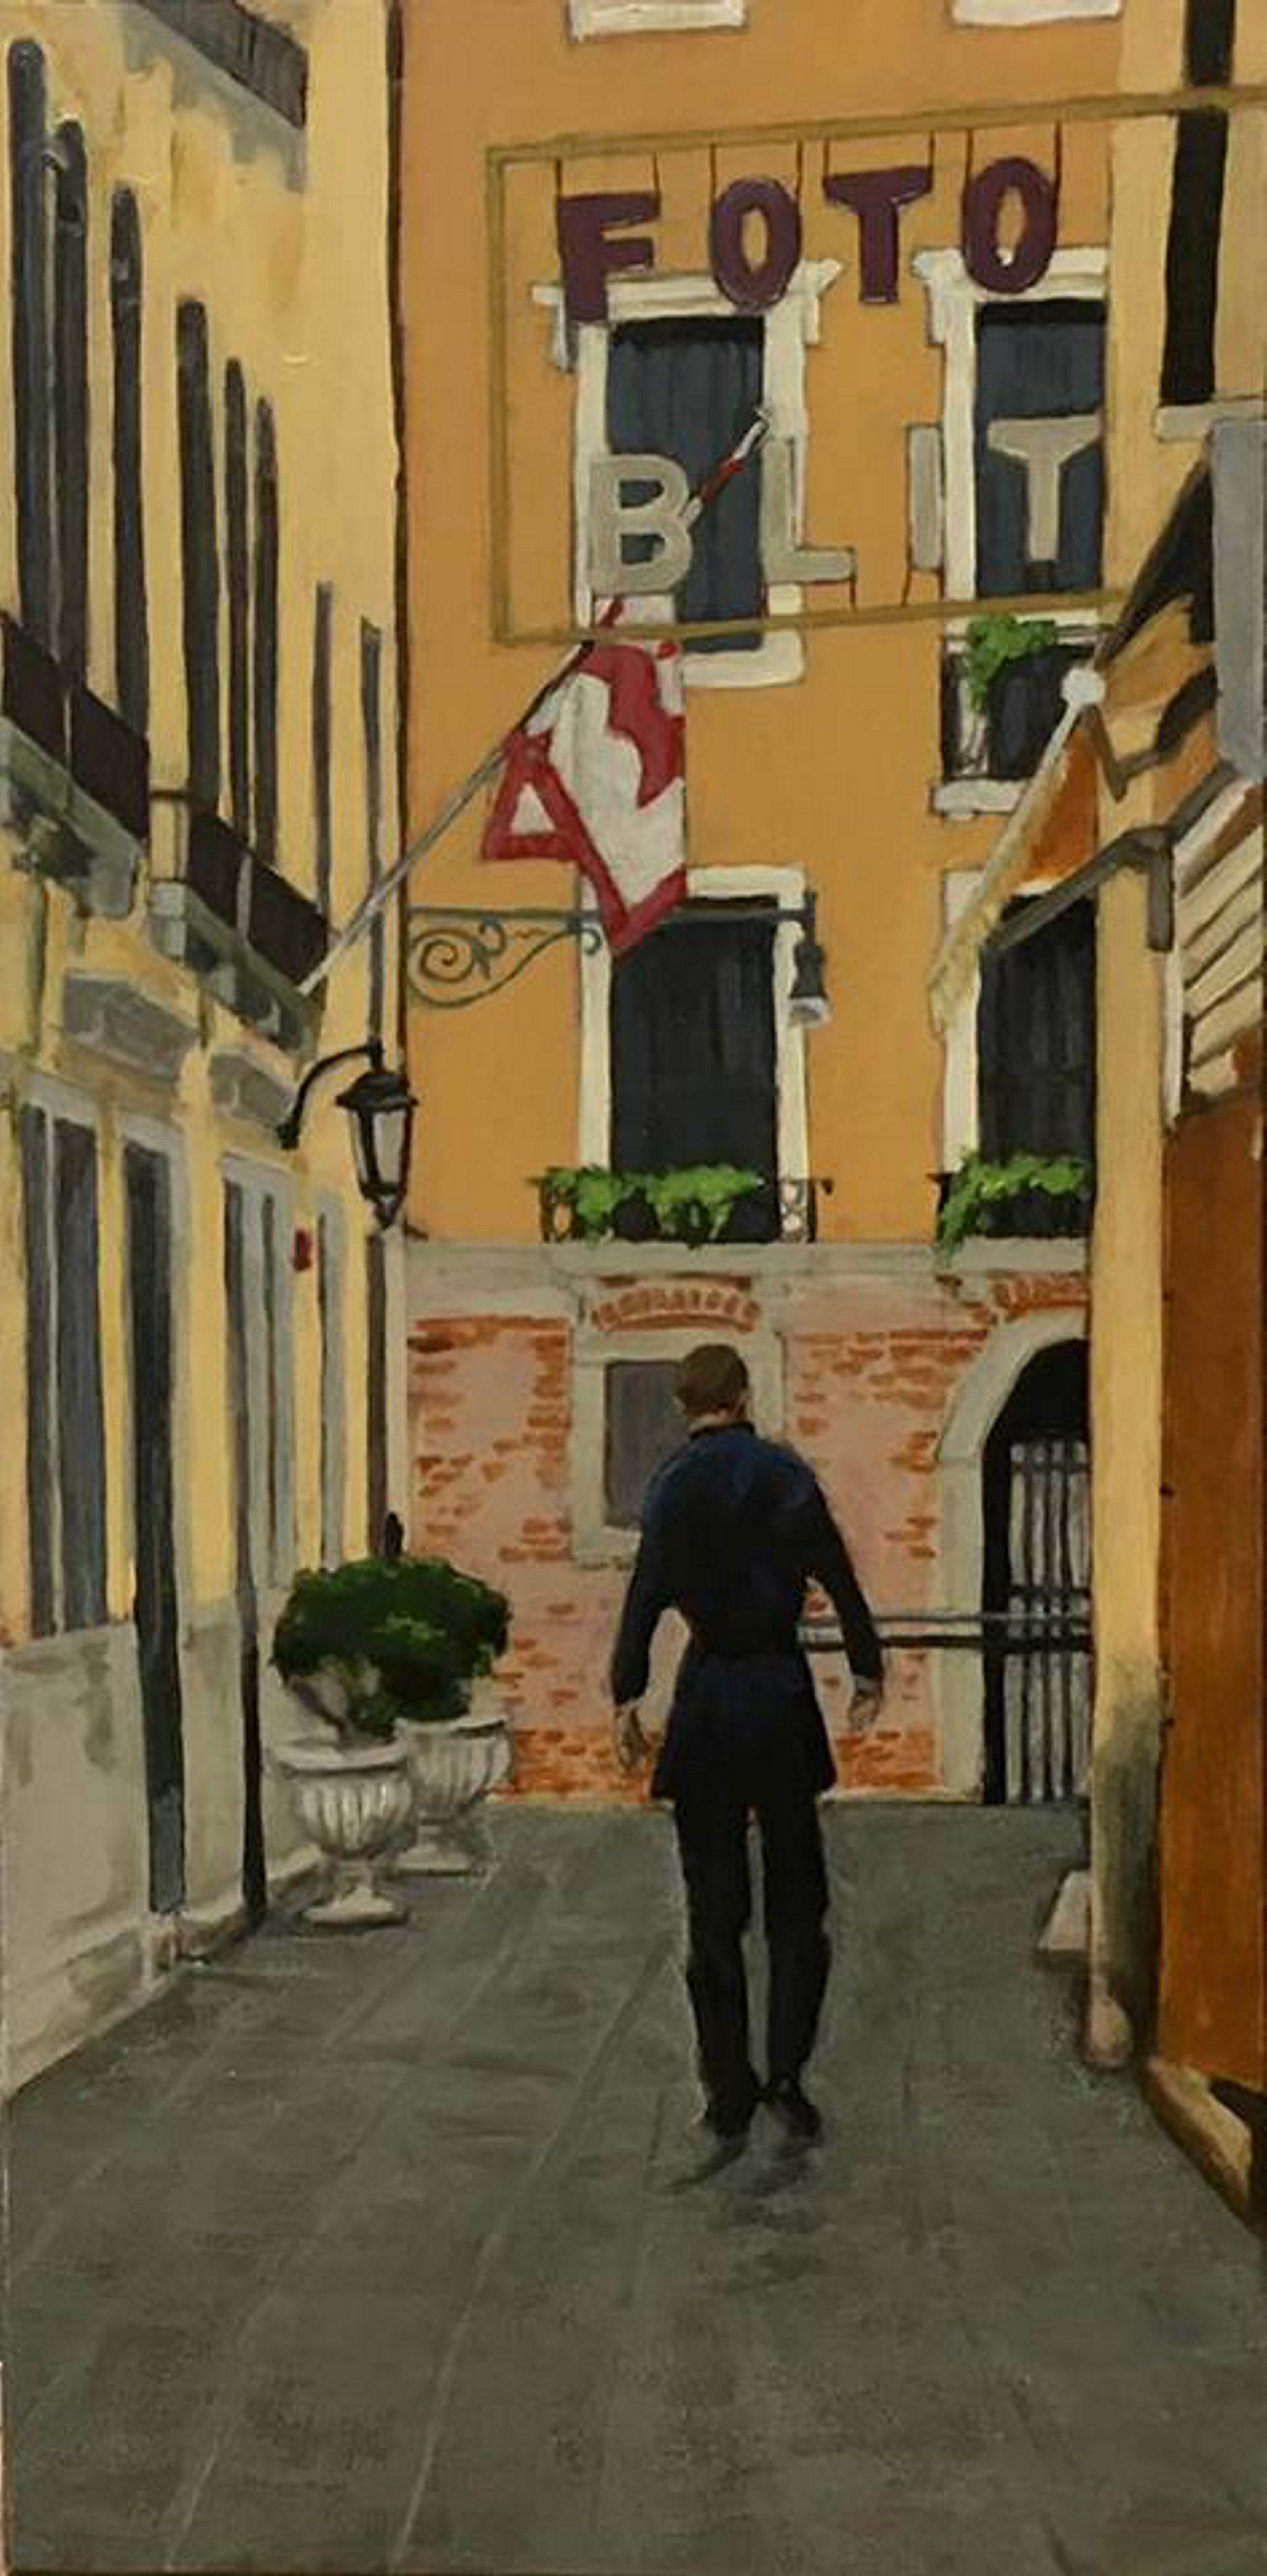 foto blitz, venezia